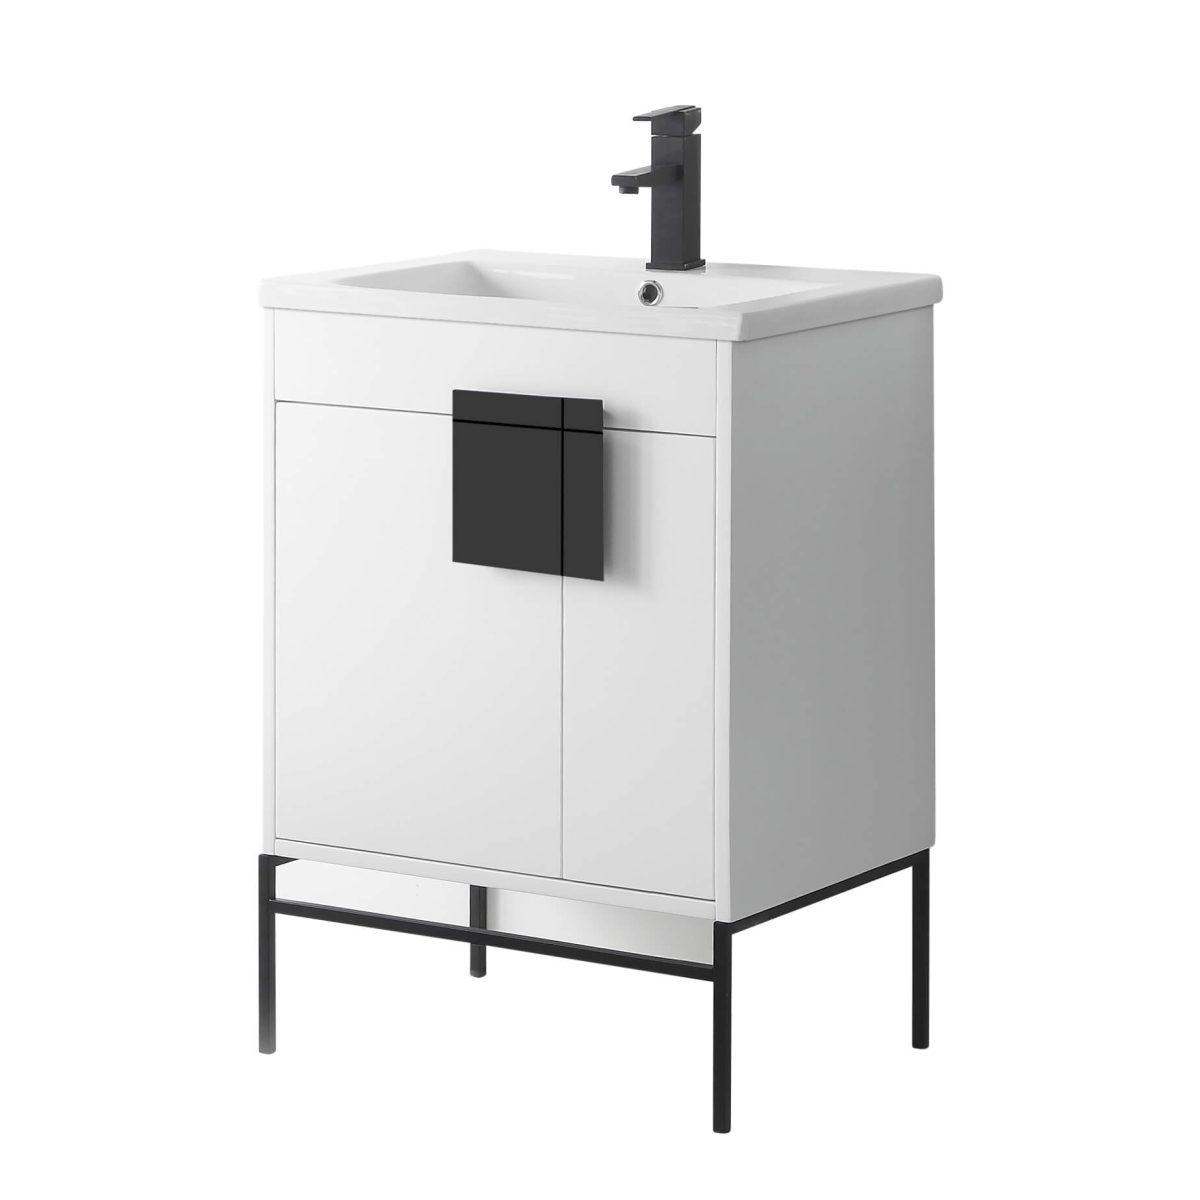 "Shawbridge 24"" Modern Bathroom Vanity  White with Black Hardware"